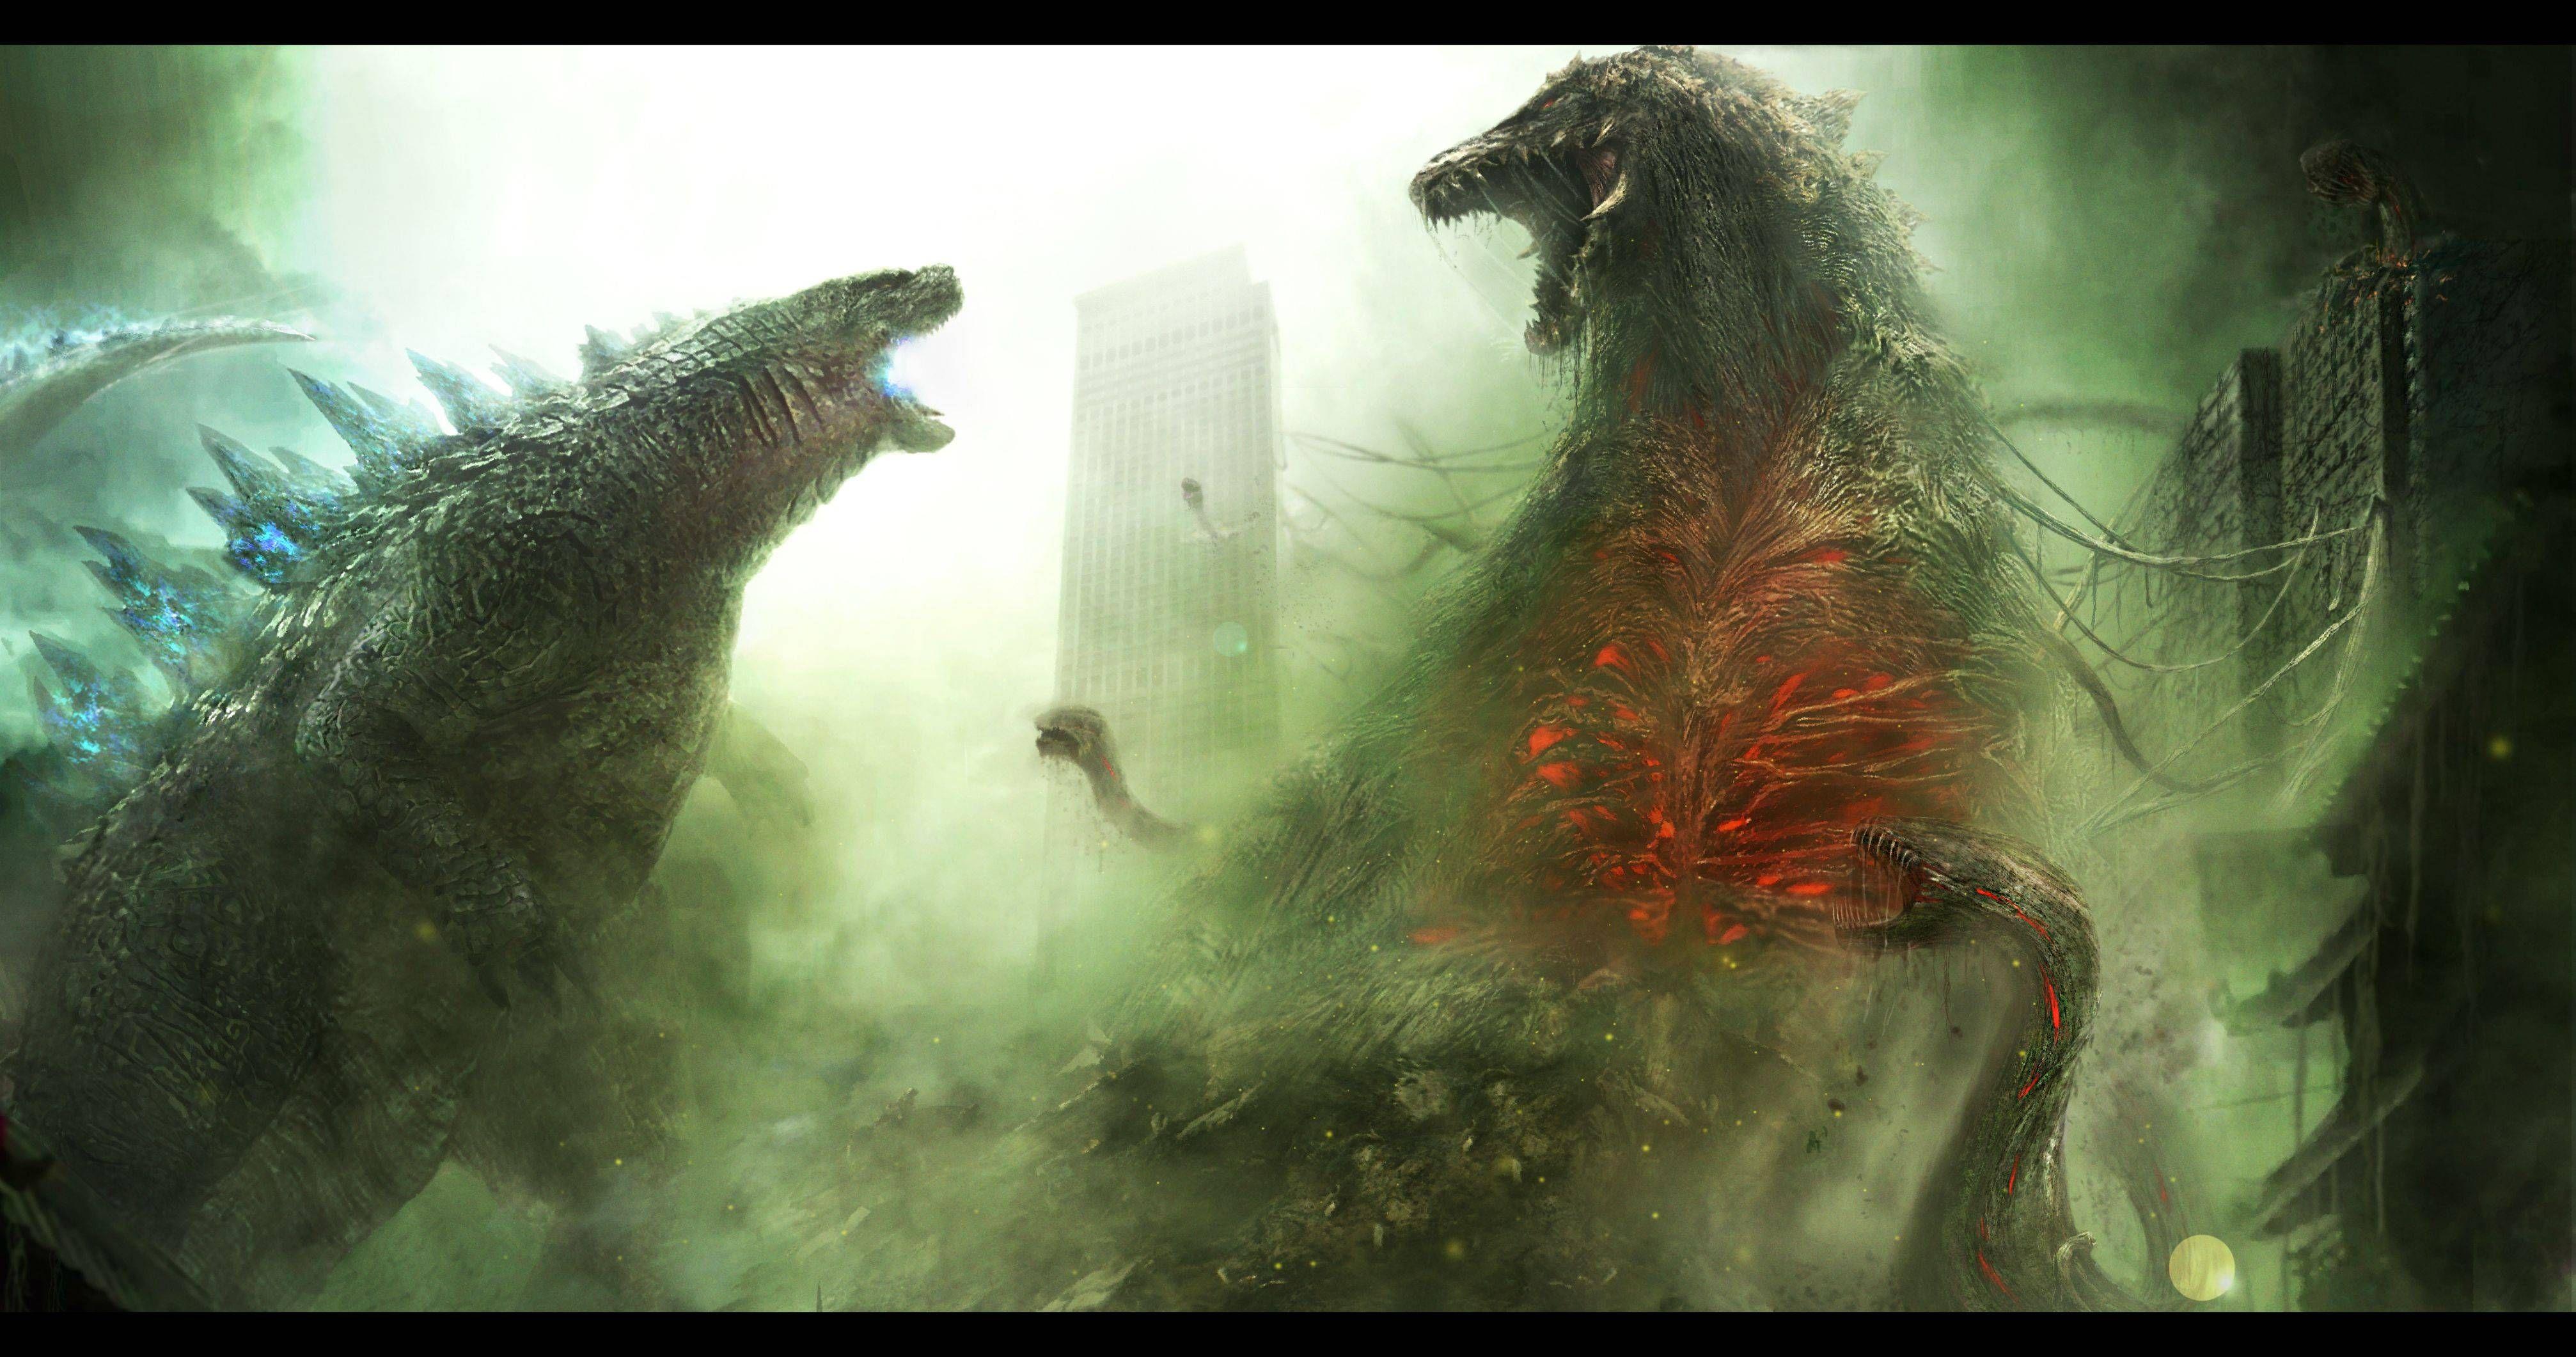 Legendary biollante godzilla in 2019 Godzilla Godzilla vs 4028x2122